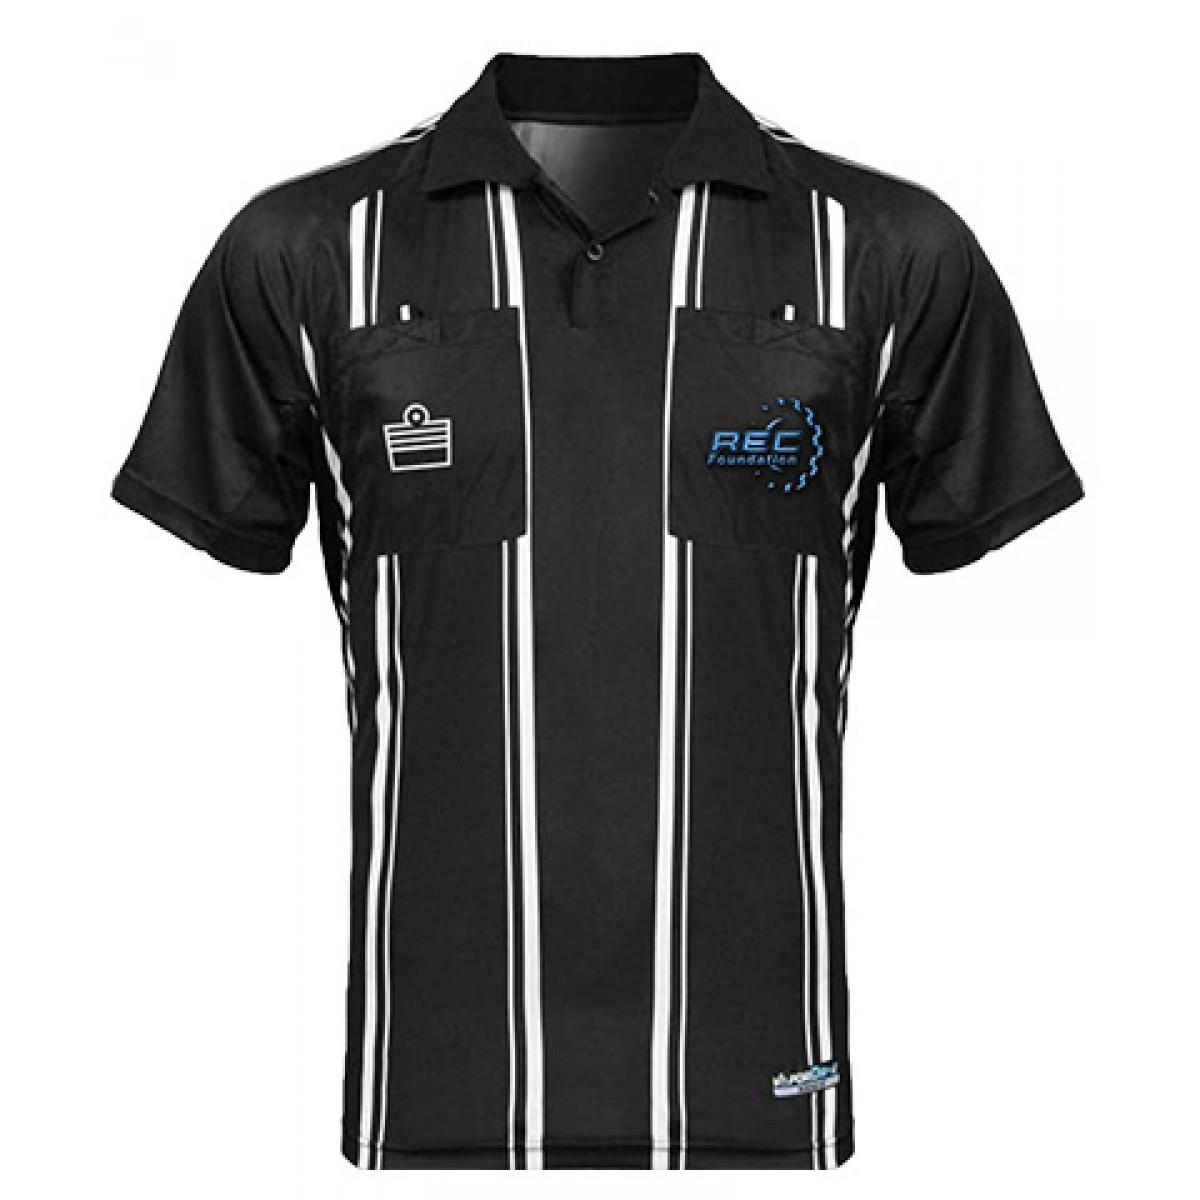 Admiral Pro Referee Jersey SS-Black-3XL